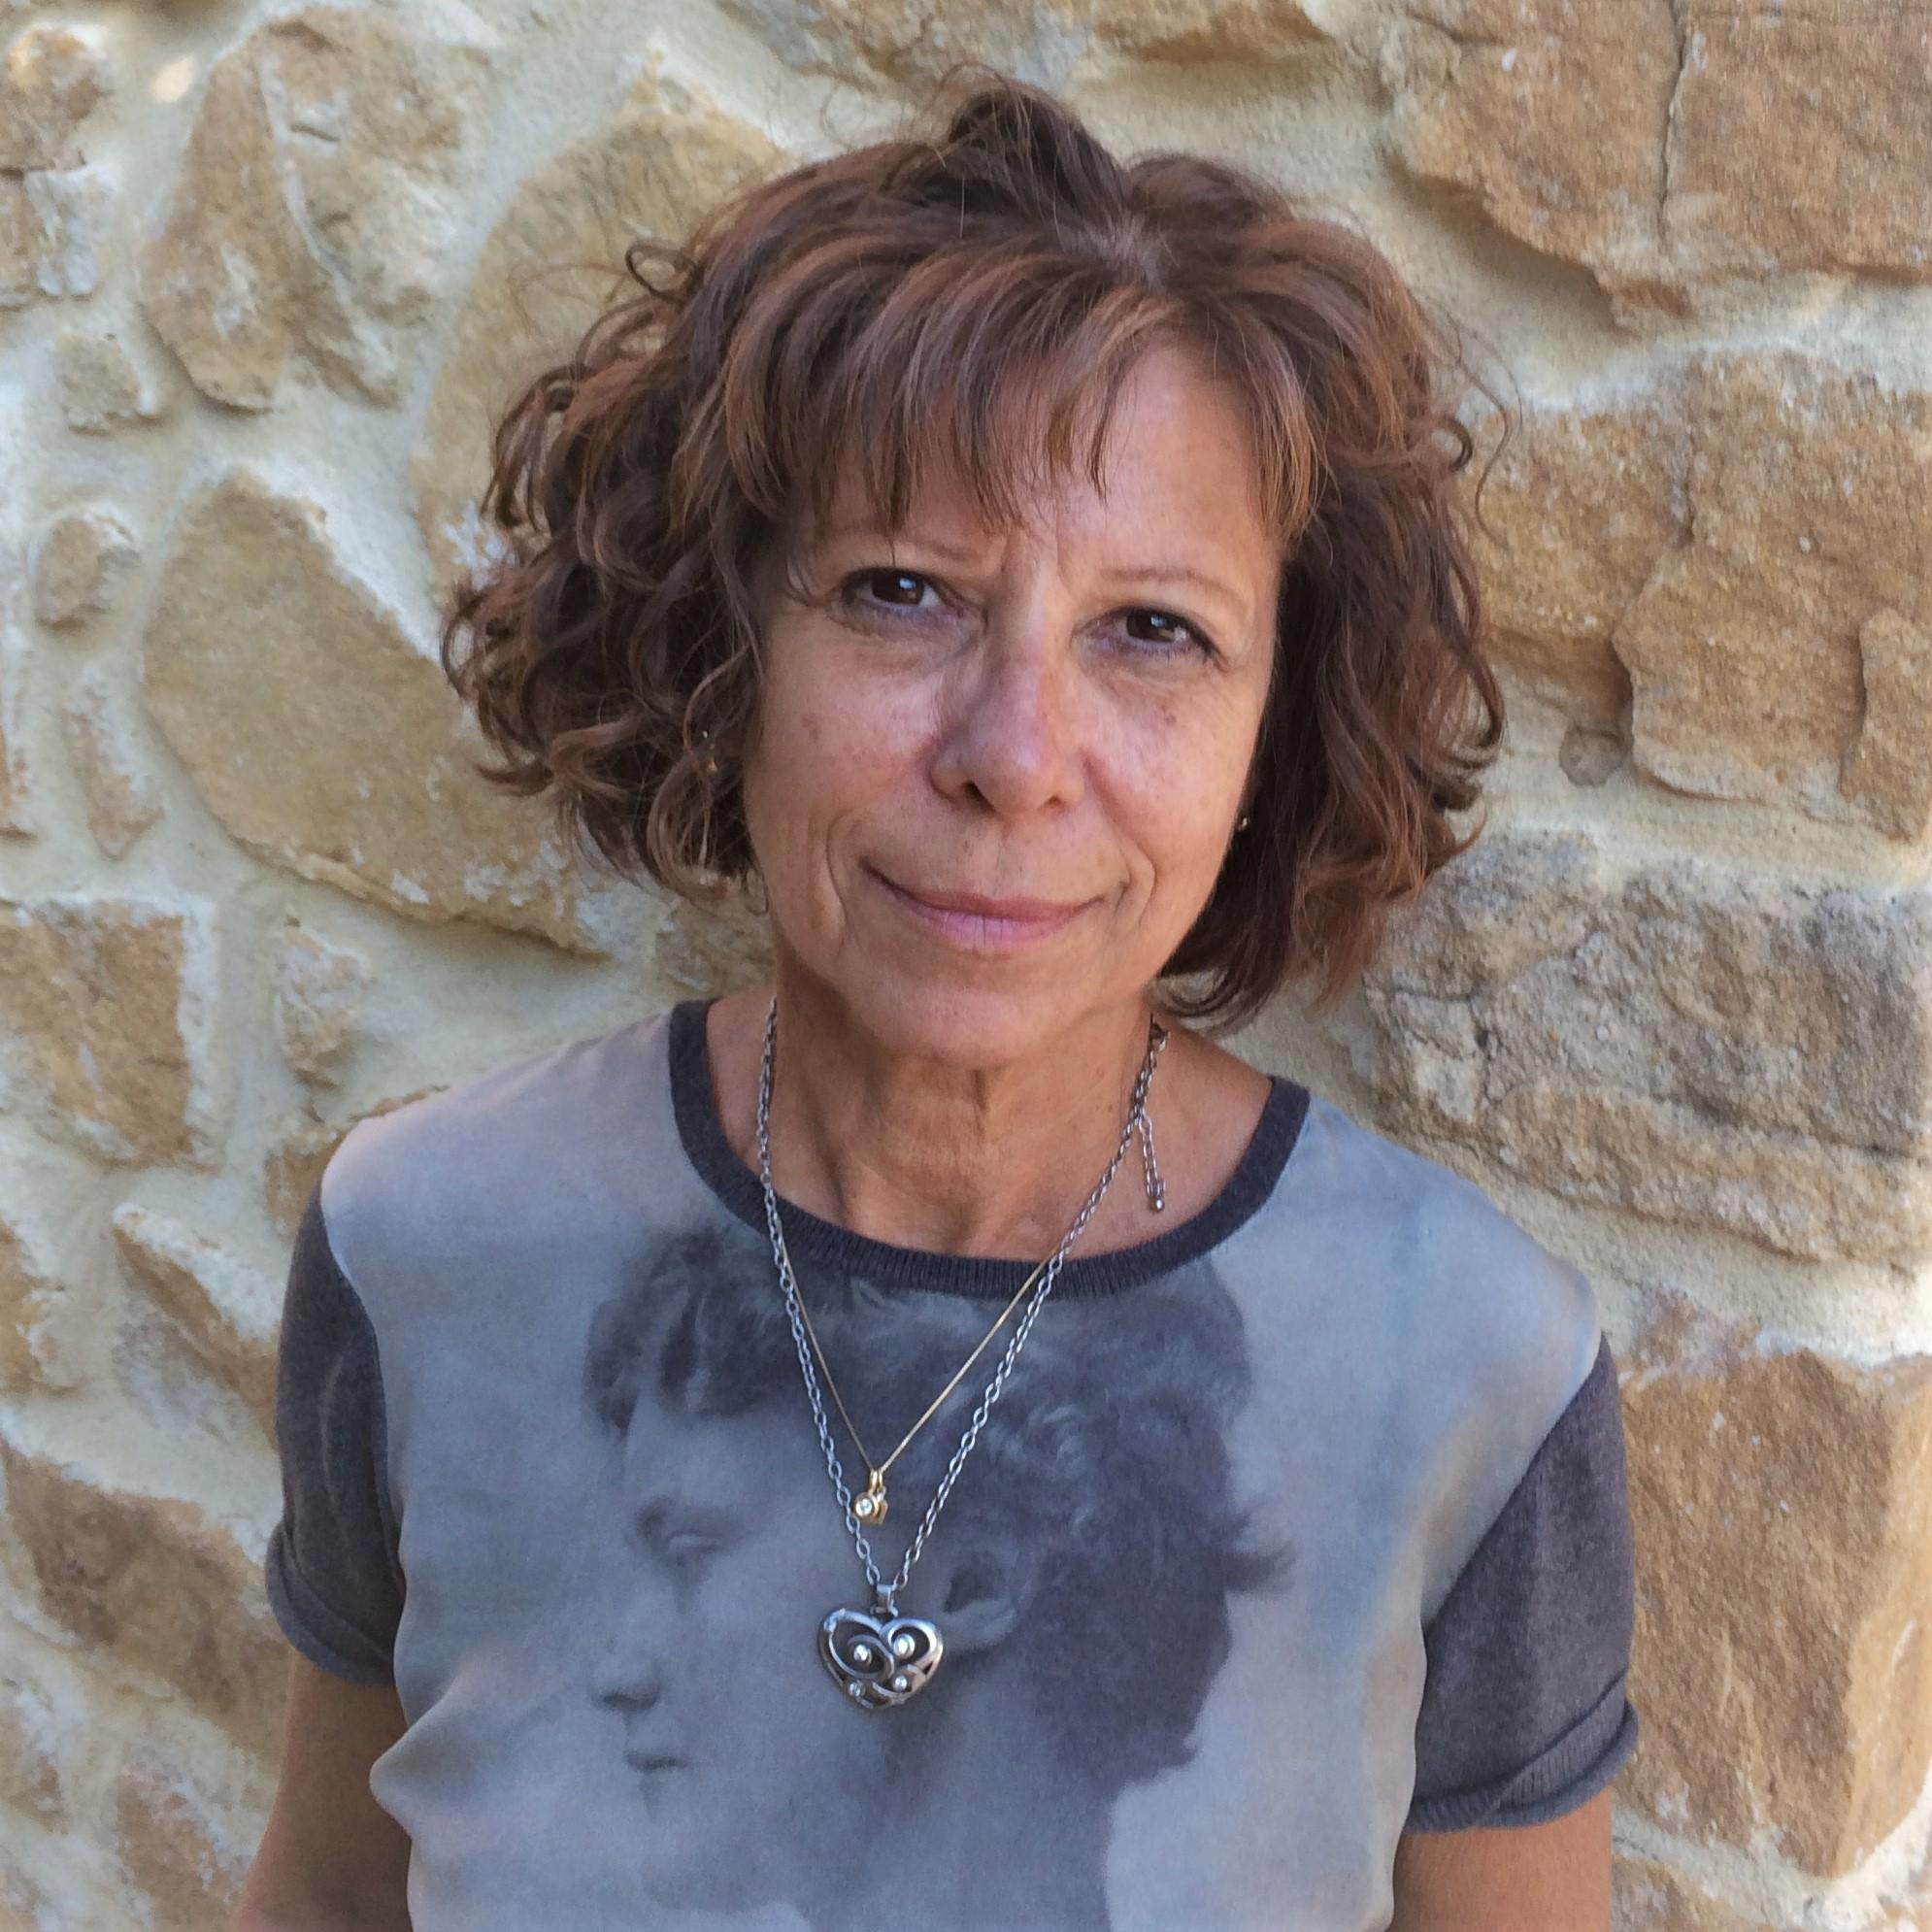 Danièle Roudil, Coordinator of INSIDER